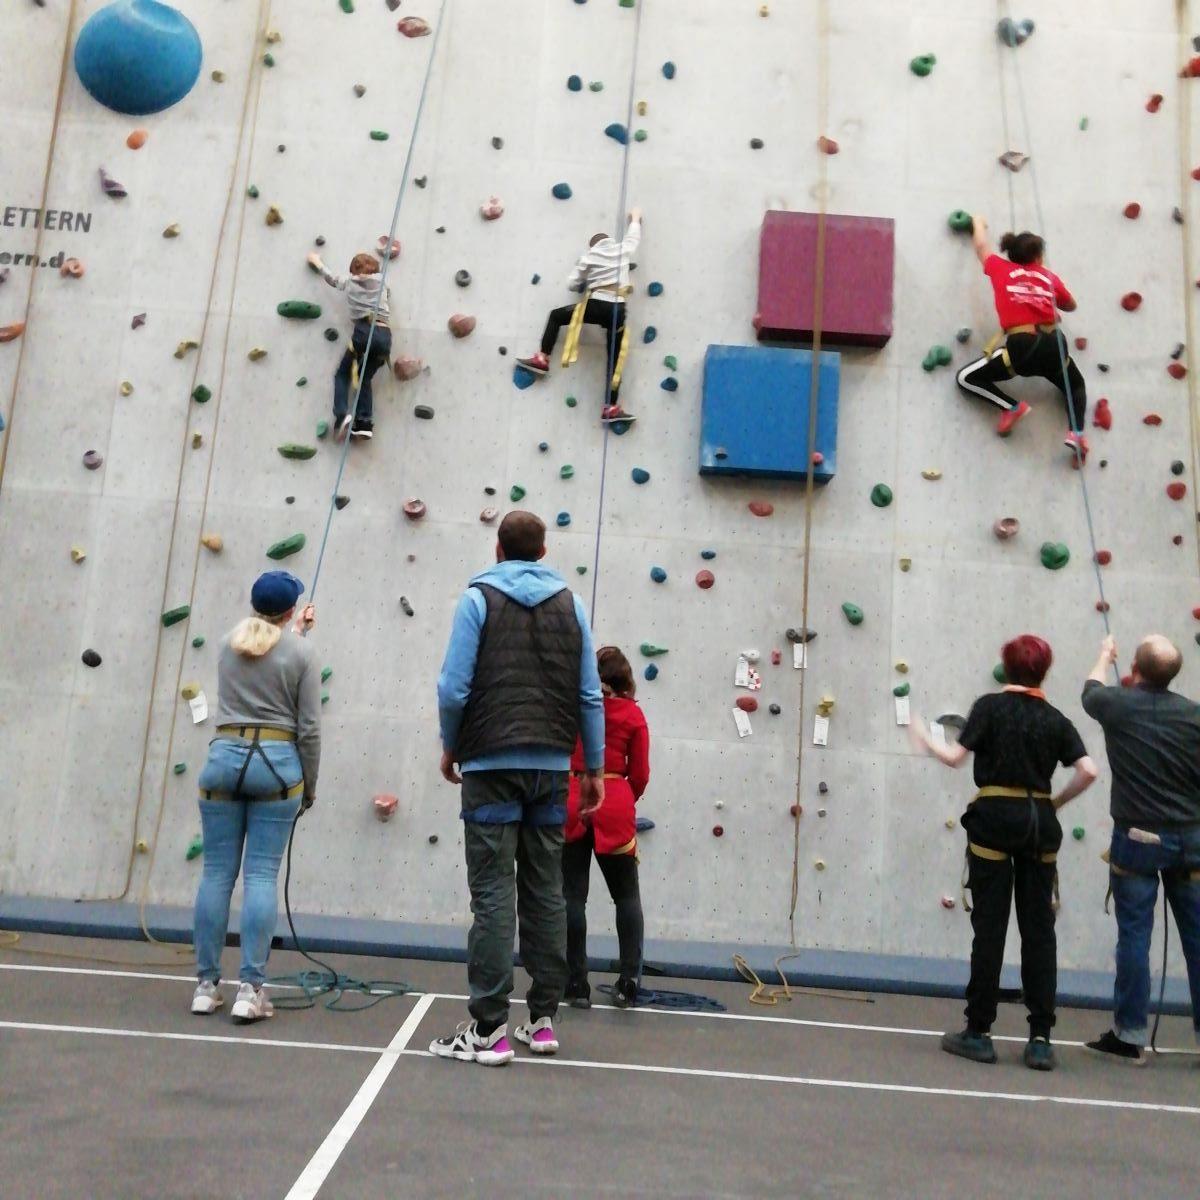 Let's rock it – Kletterspaß statt Online-Verdruss